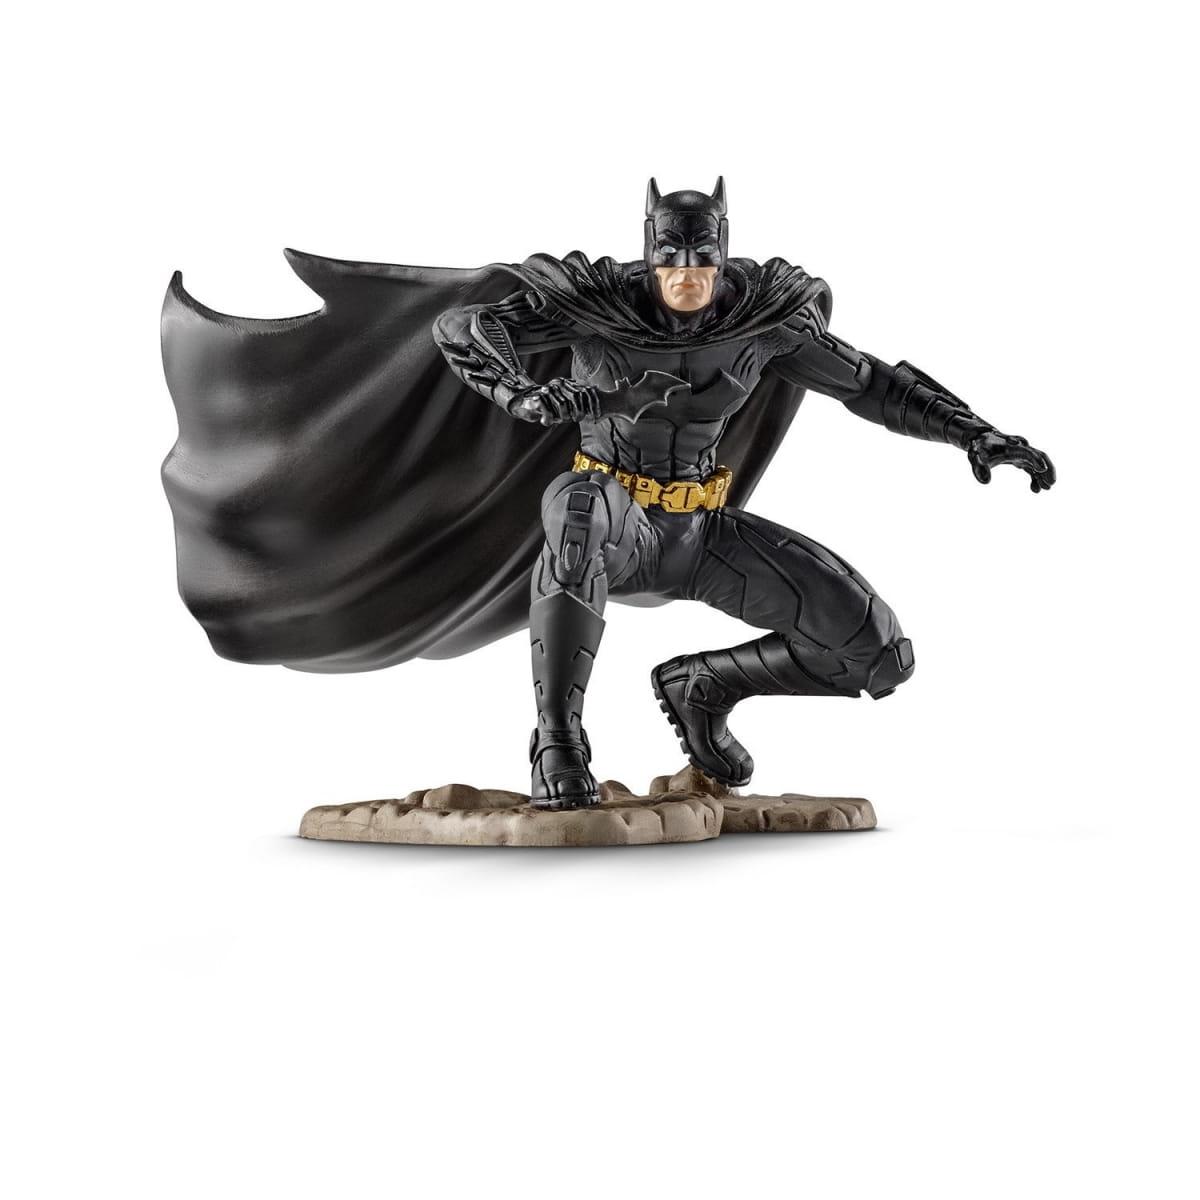 Фигурка Schleich 22503 Сражающийся Бэтмен